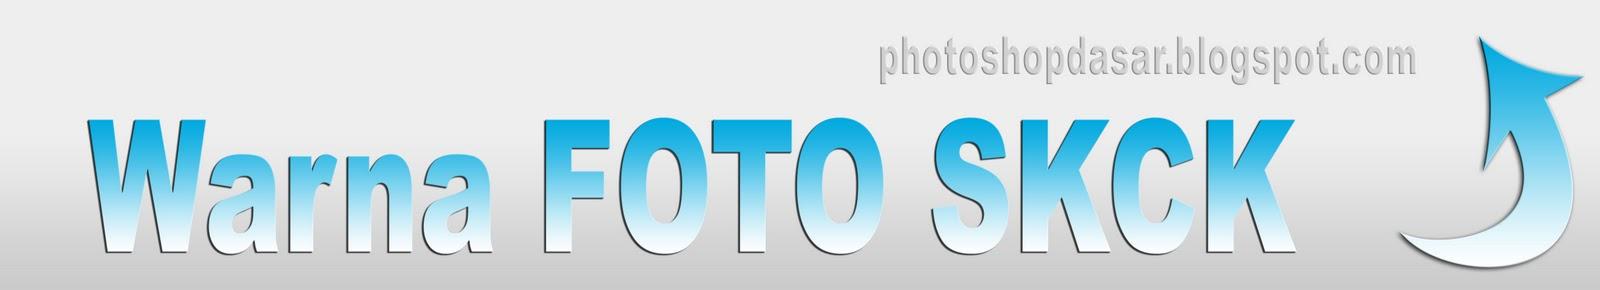 Warna Foto Untuk Skck Photoshop Dasar